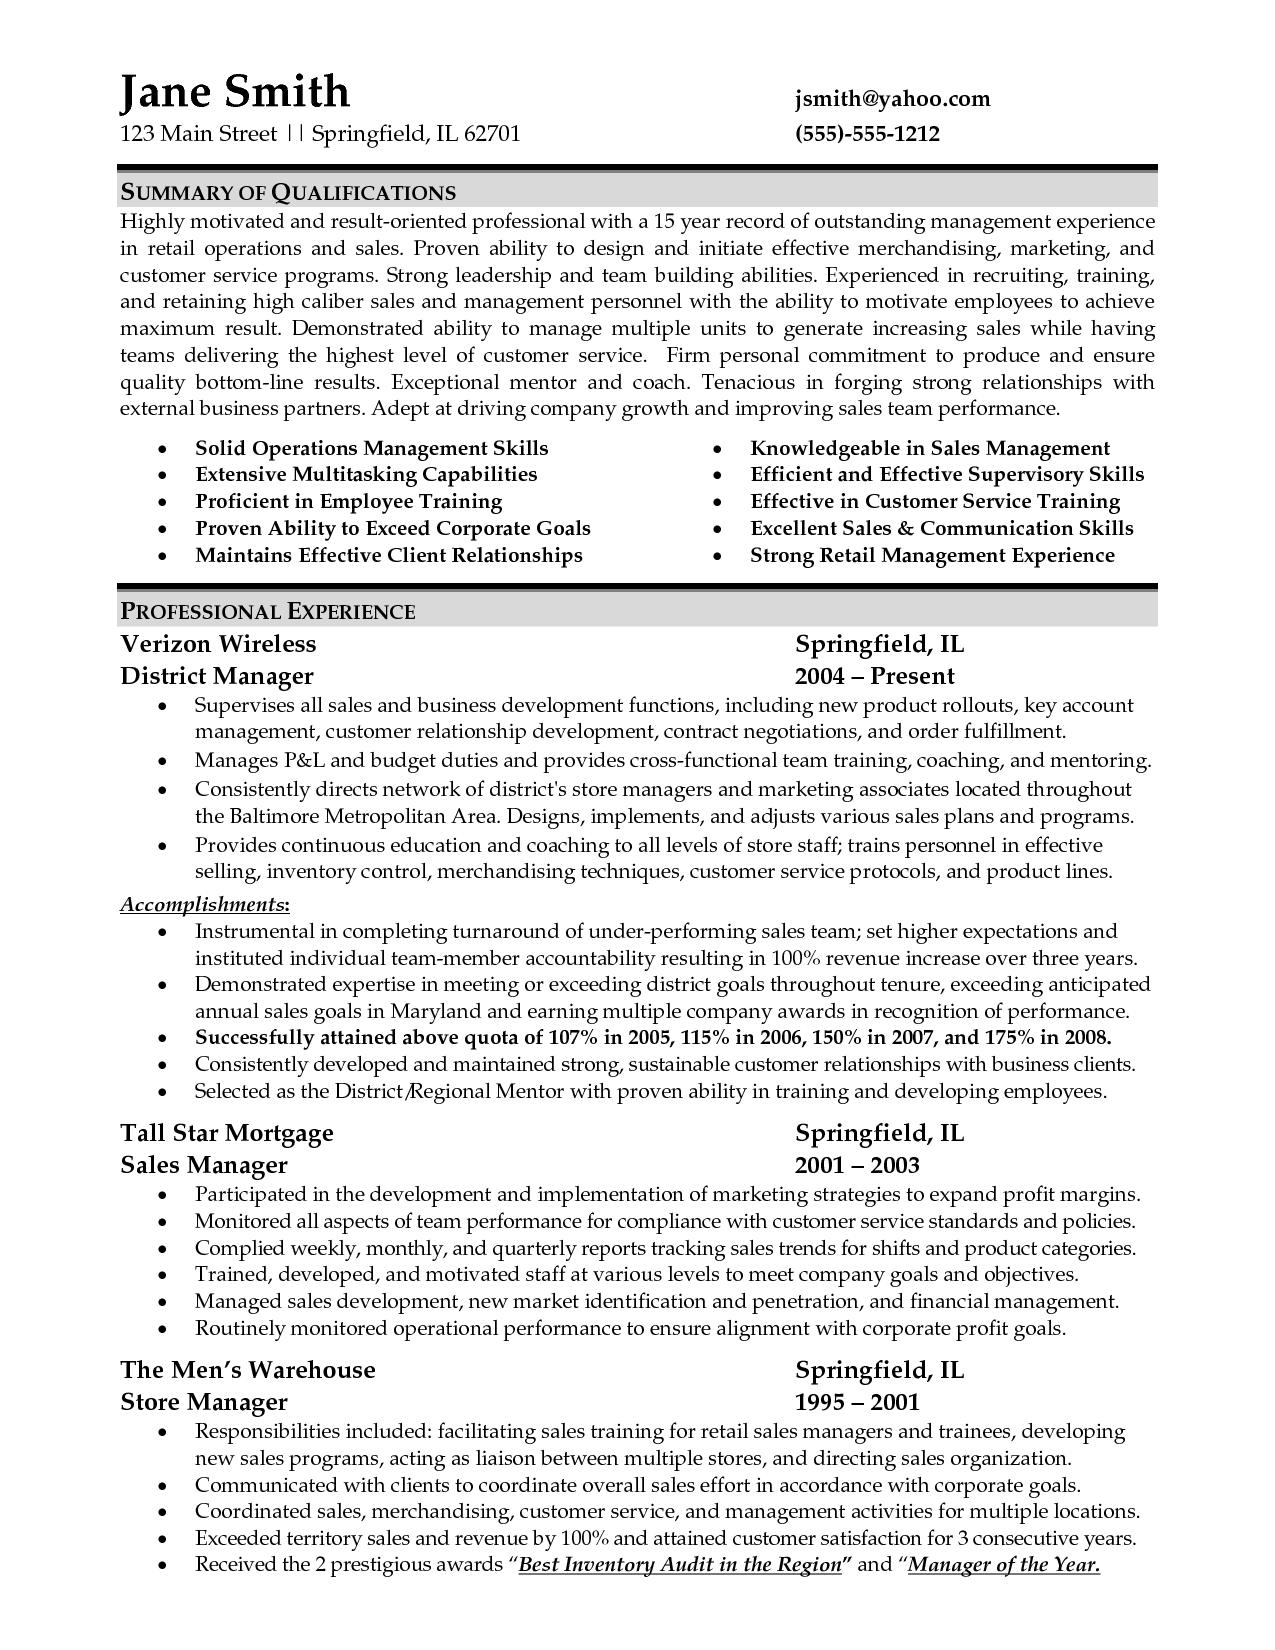 Sample Resume For Retail Management Job